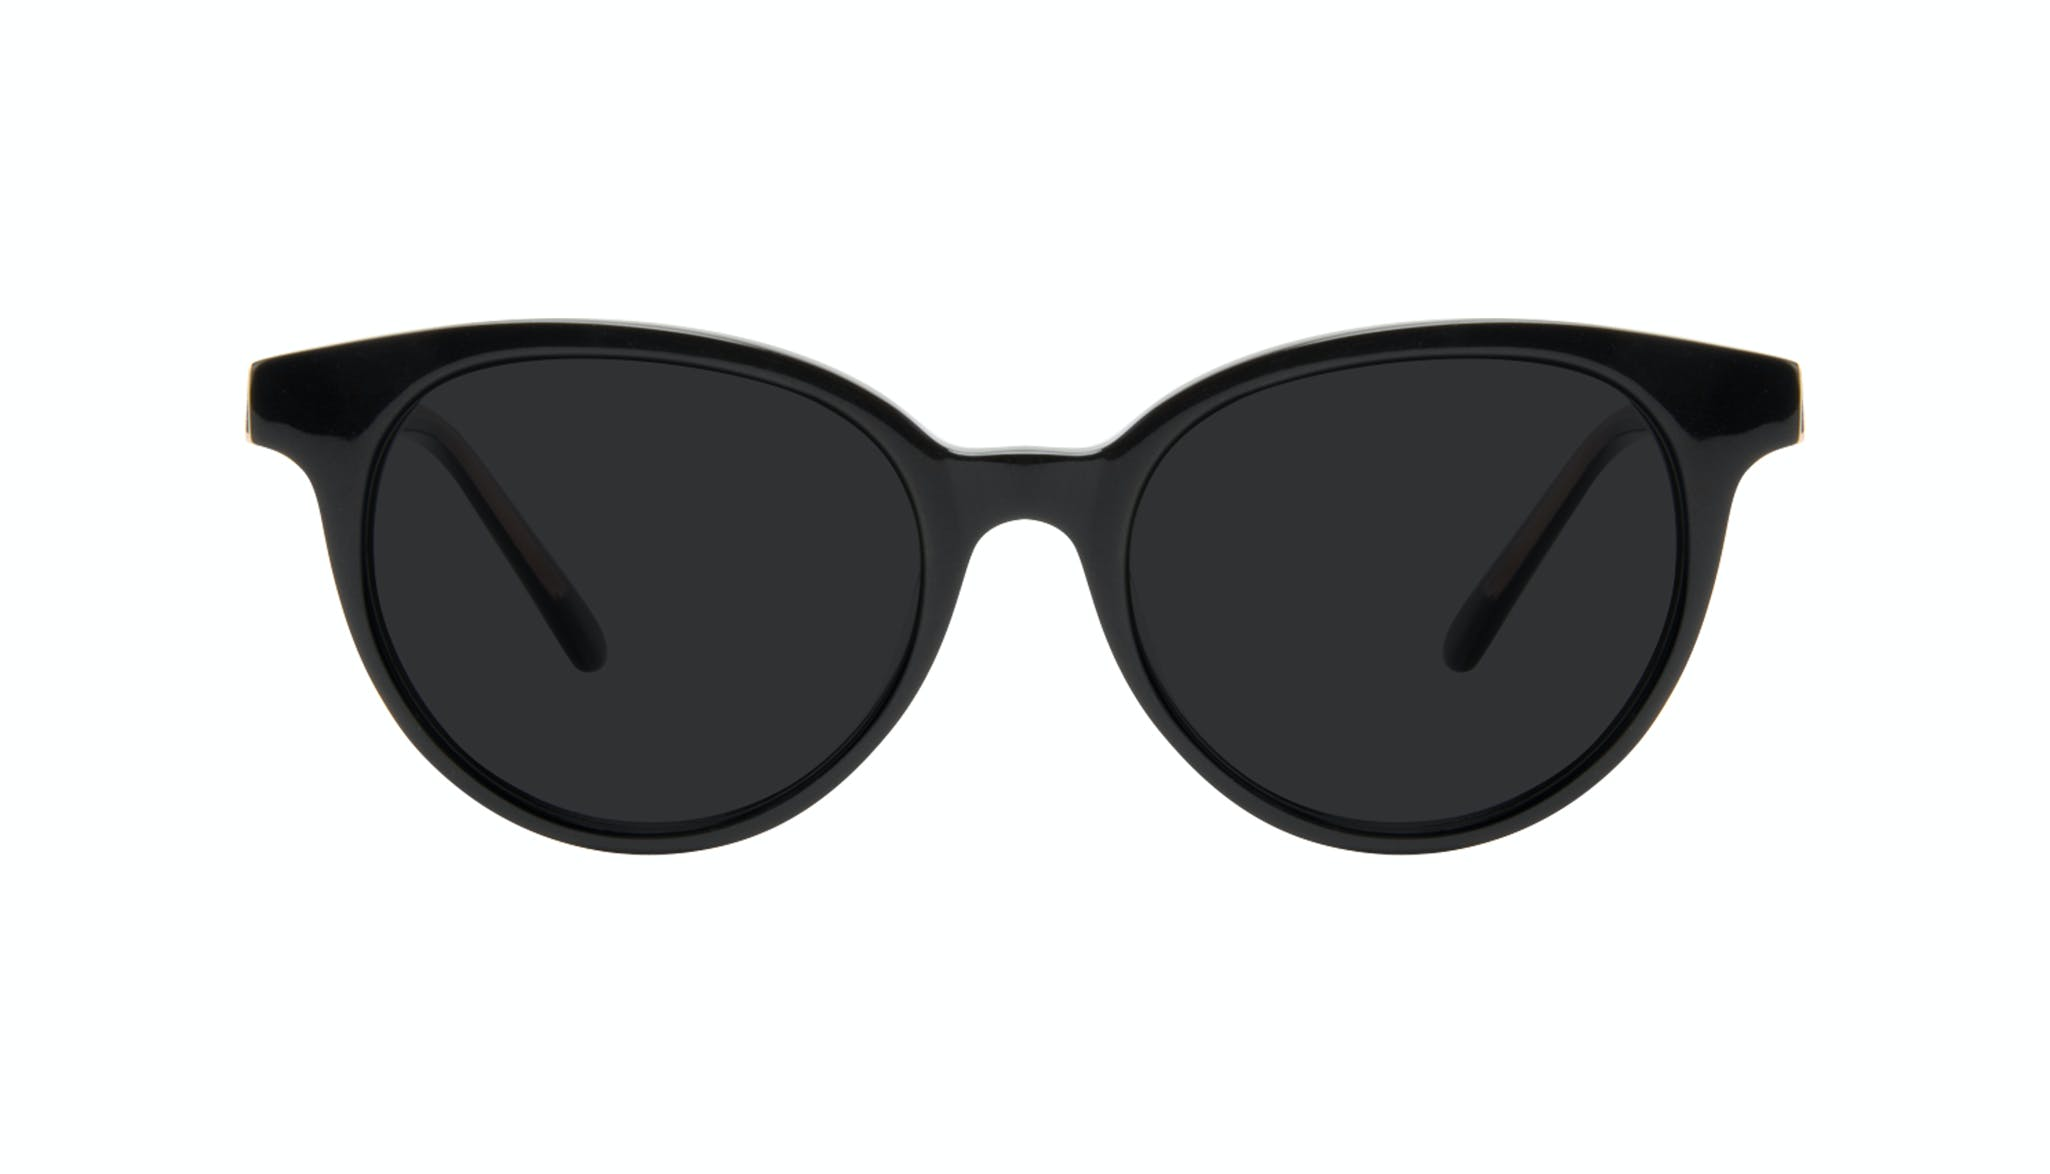 Affordable Fashion Glasses Round Sunglasses Women Bright Black